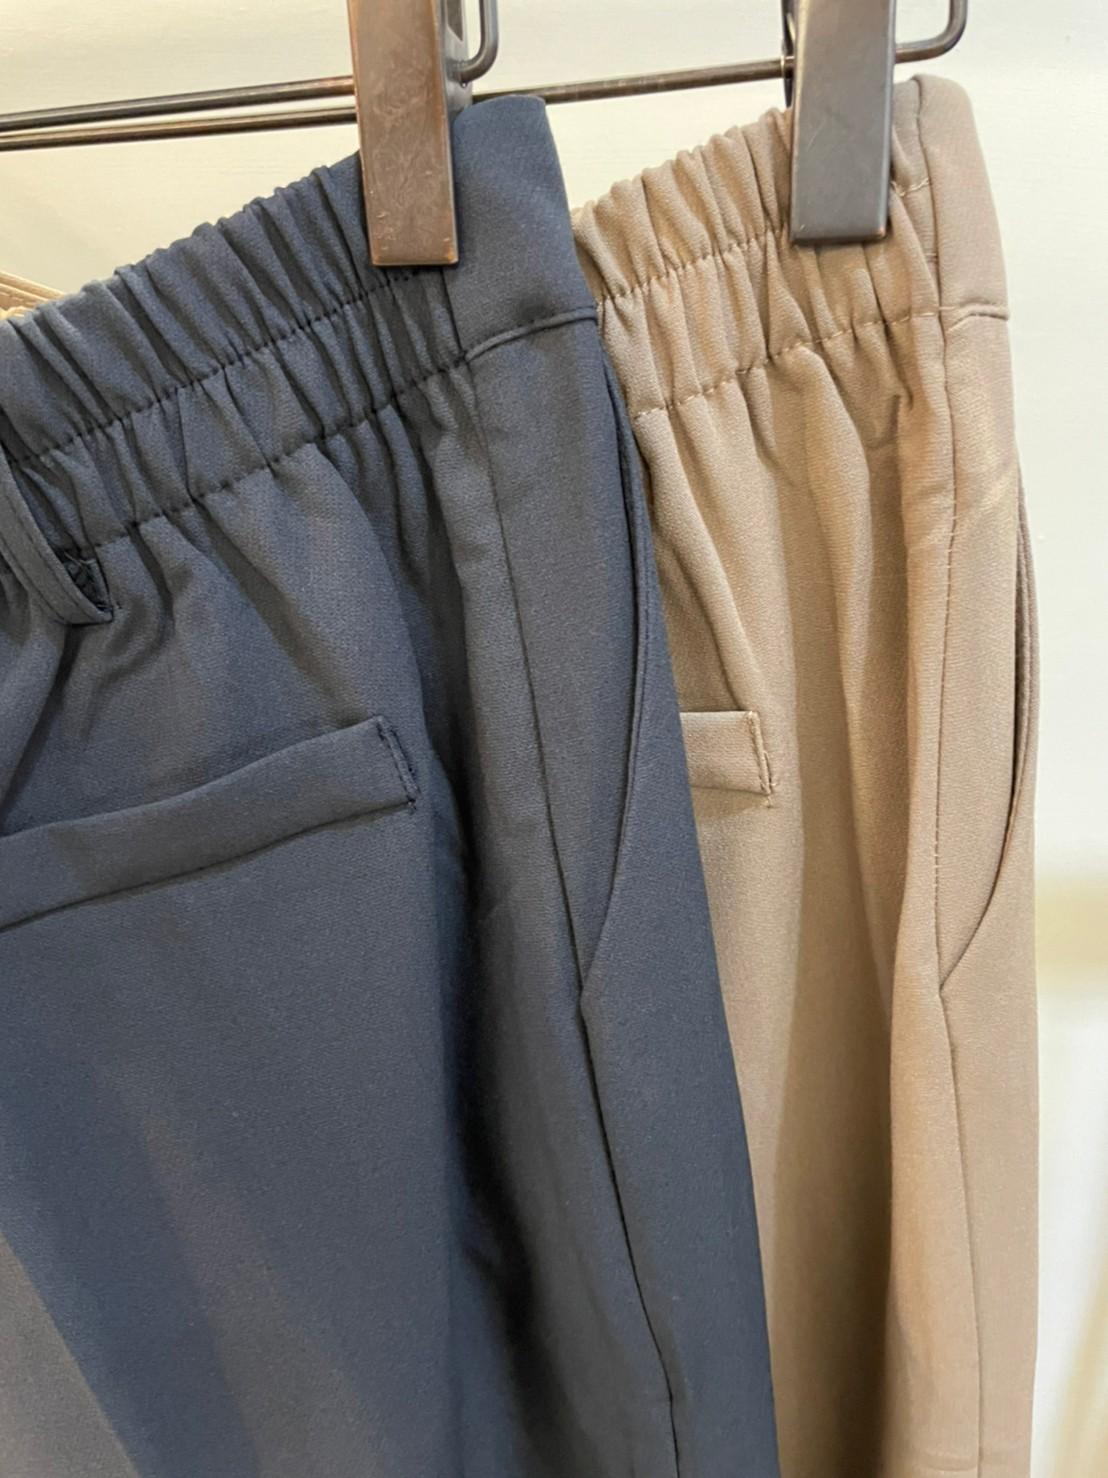 (n31)自訂款-挺西裝褲